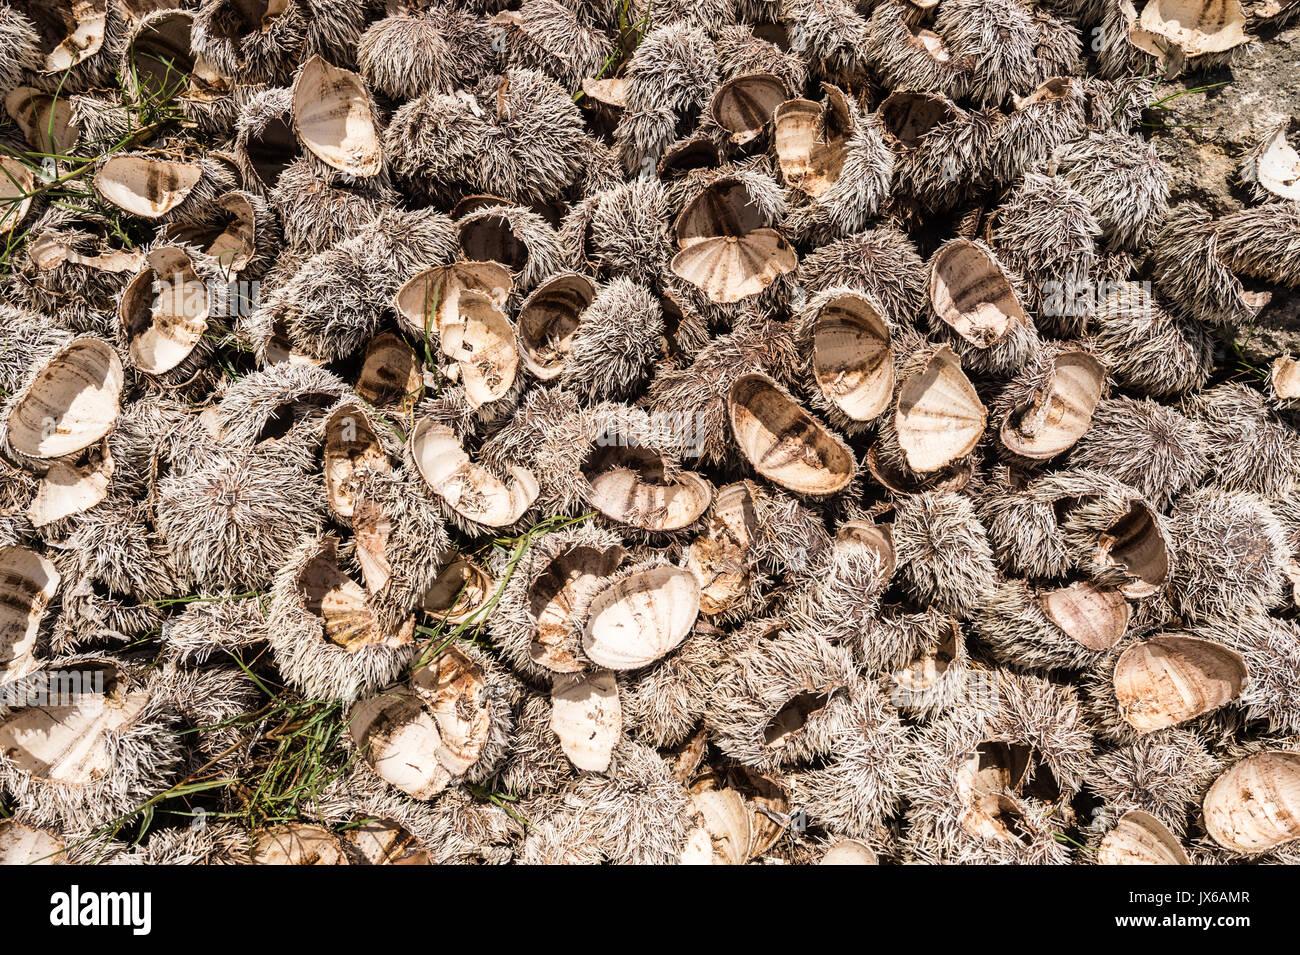 Viele Seeigel Muscheln am Strand nach links Stockbild